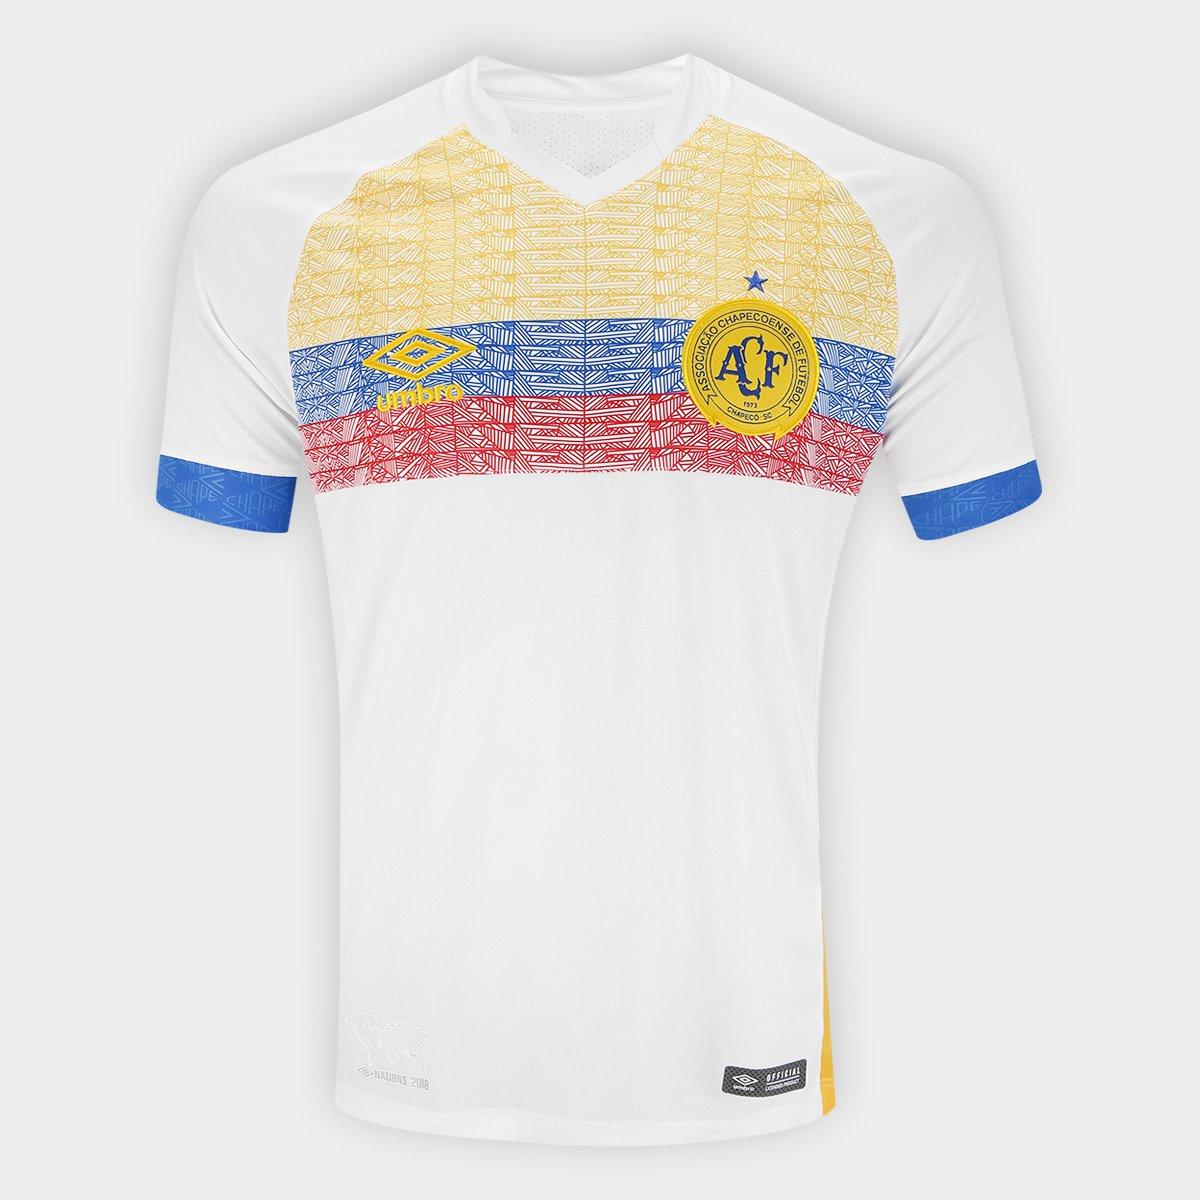 Camisa Chapecoense II 2018 s n° La Pasion Torcedor Umbro Masculina ... edf61e601f3c1